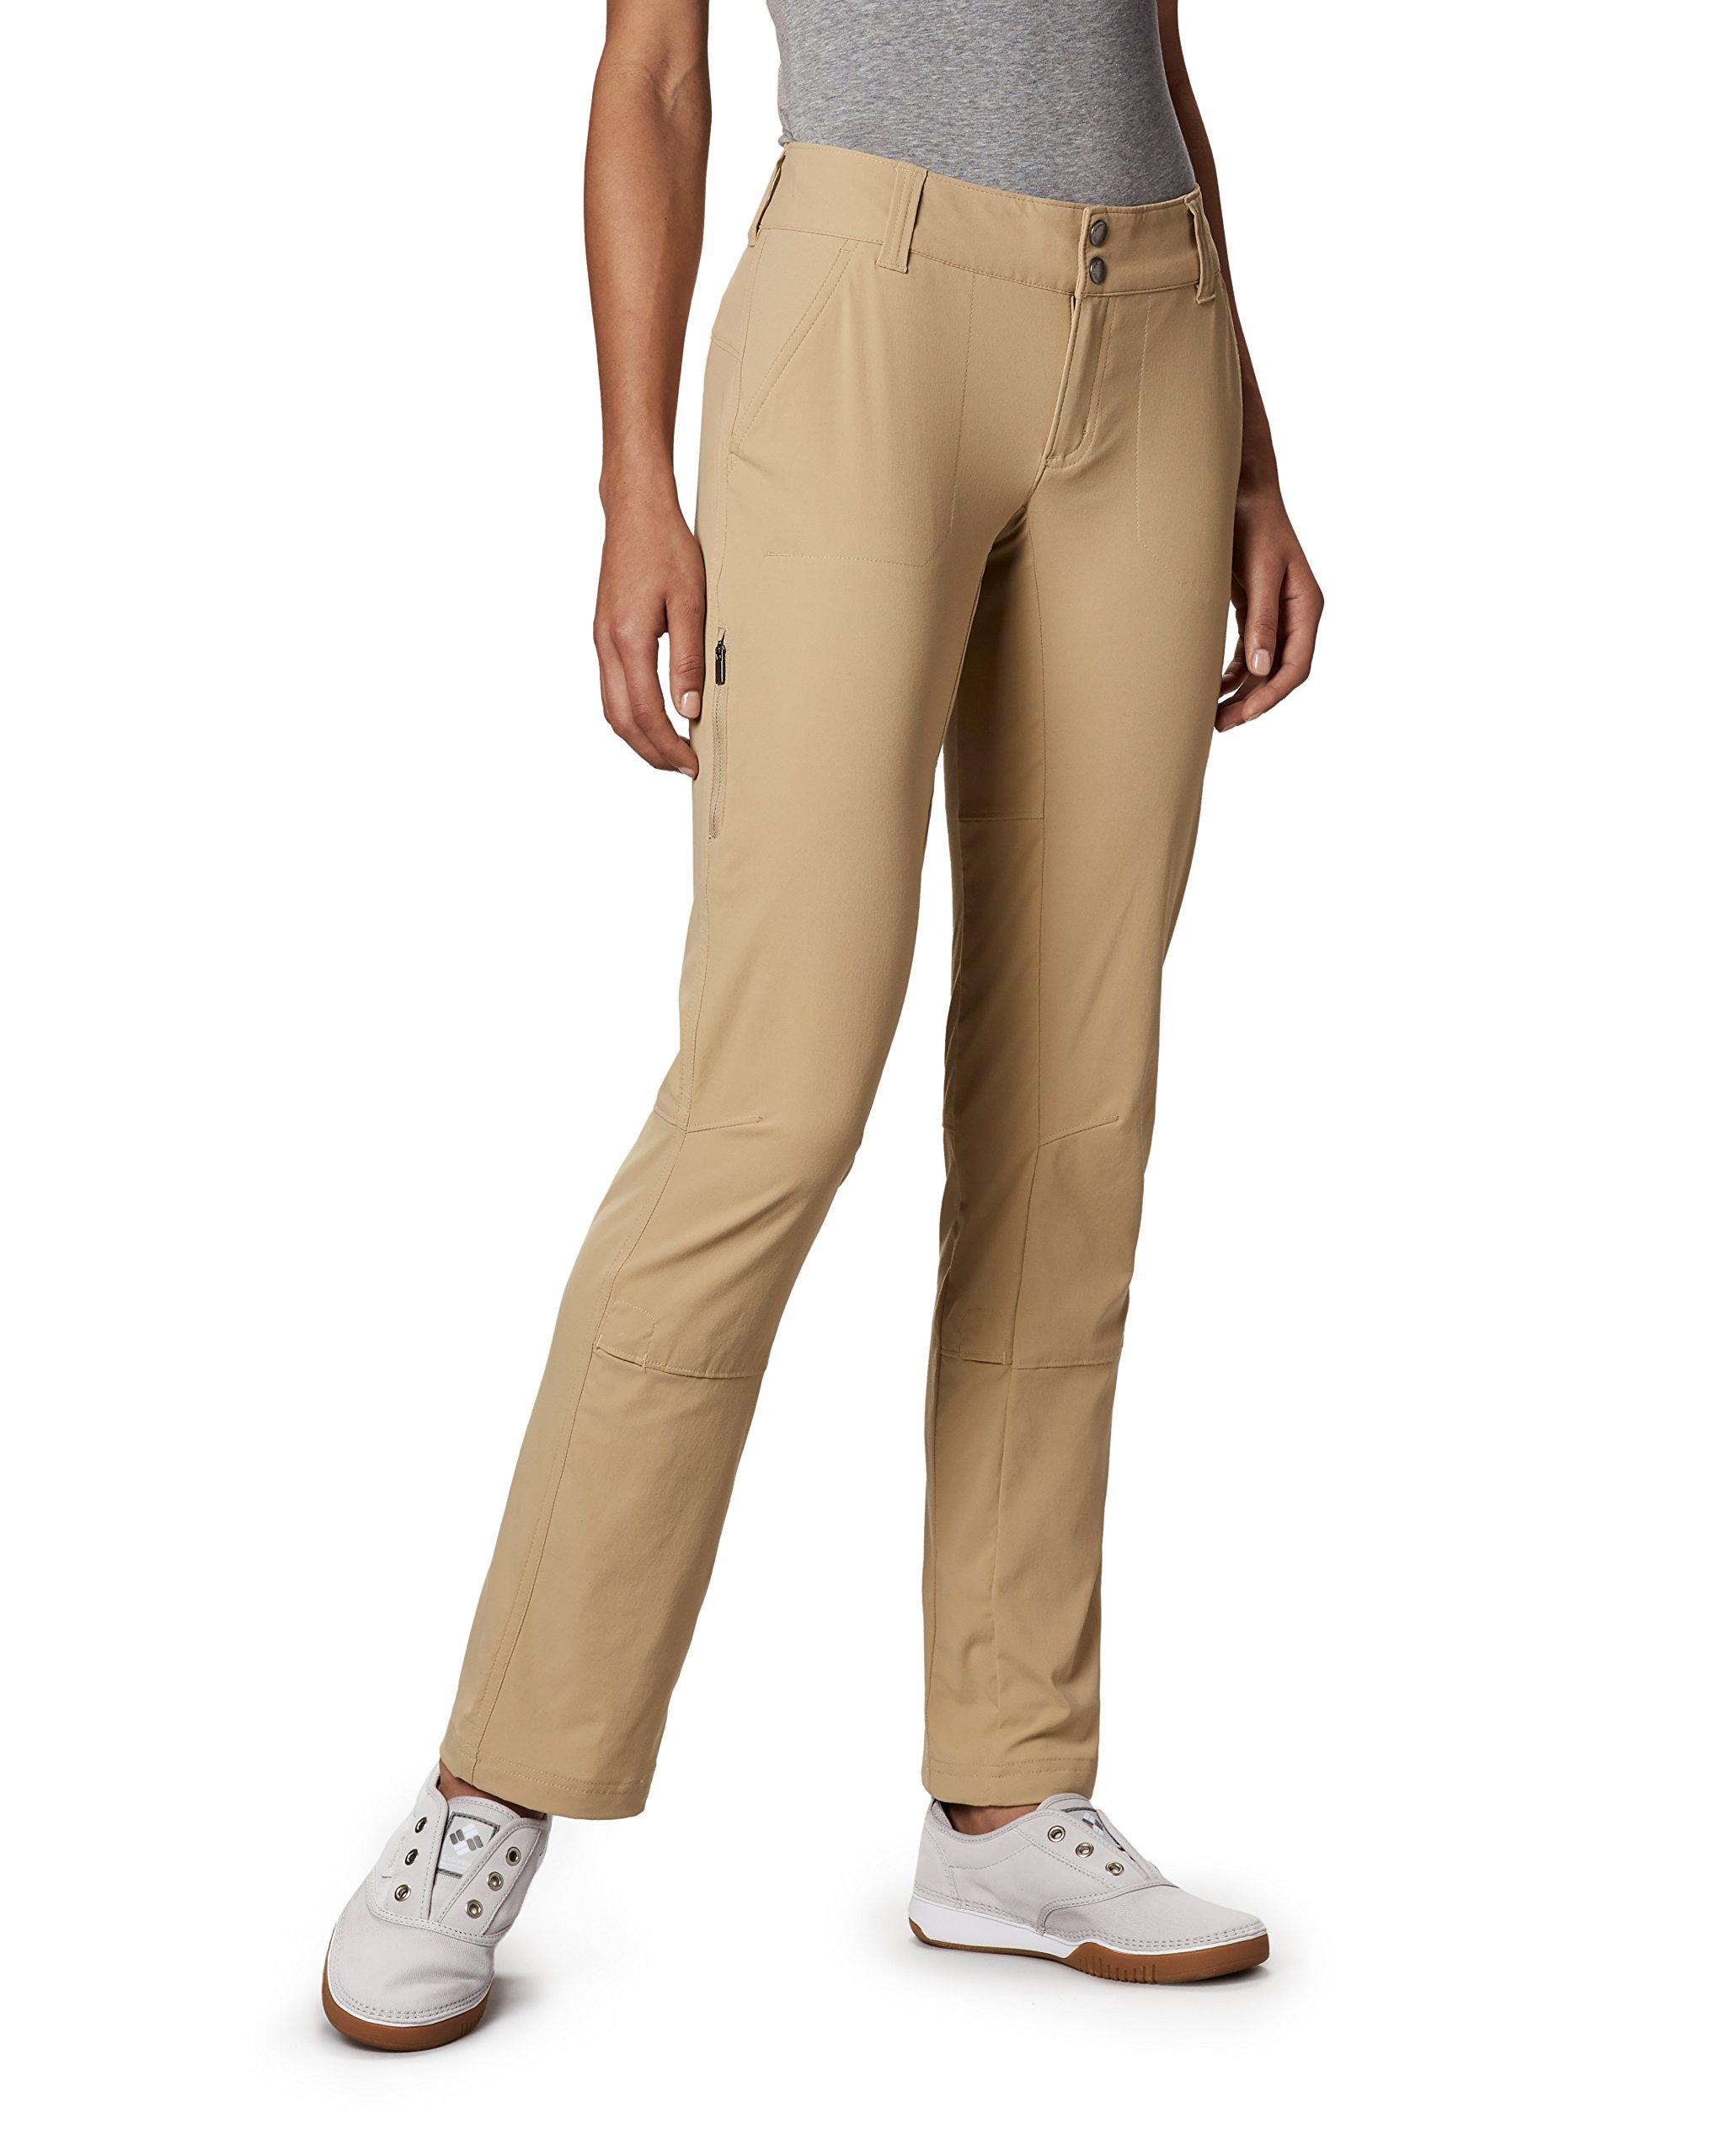 Columbia Sportswear Women's Saturday Trail Pants, British Tan,4 Regular by Columbia